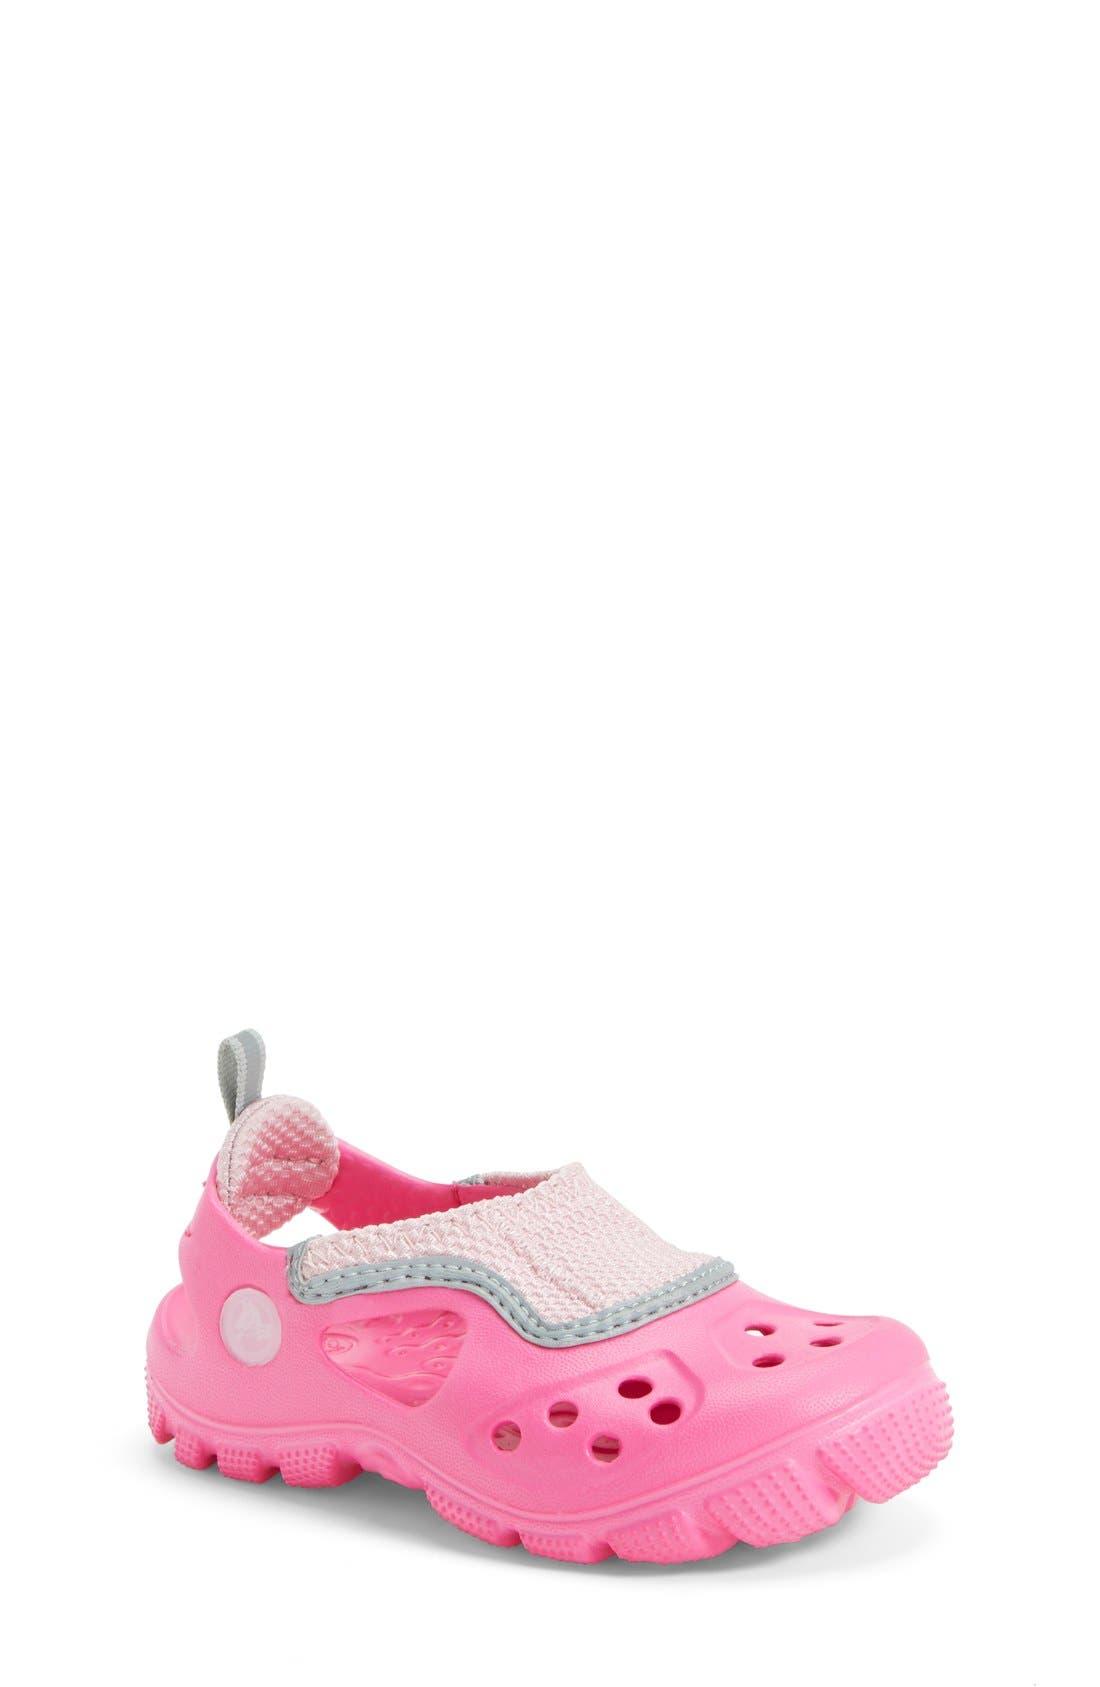 Main Image - CROCS™ 'Micah II' Sandal (Walker & Toddler)